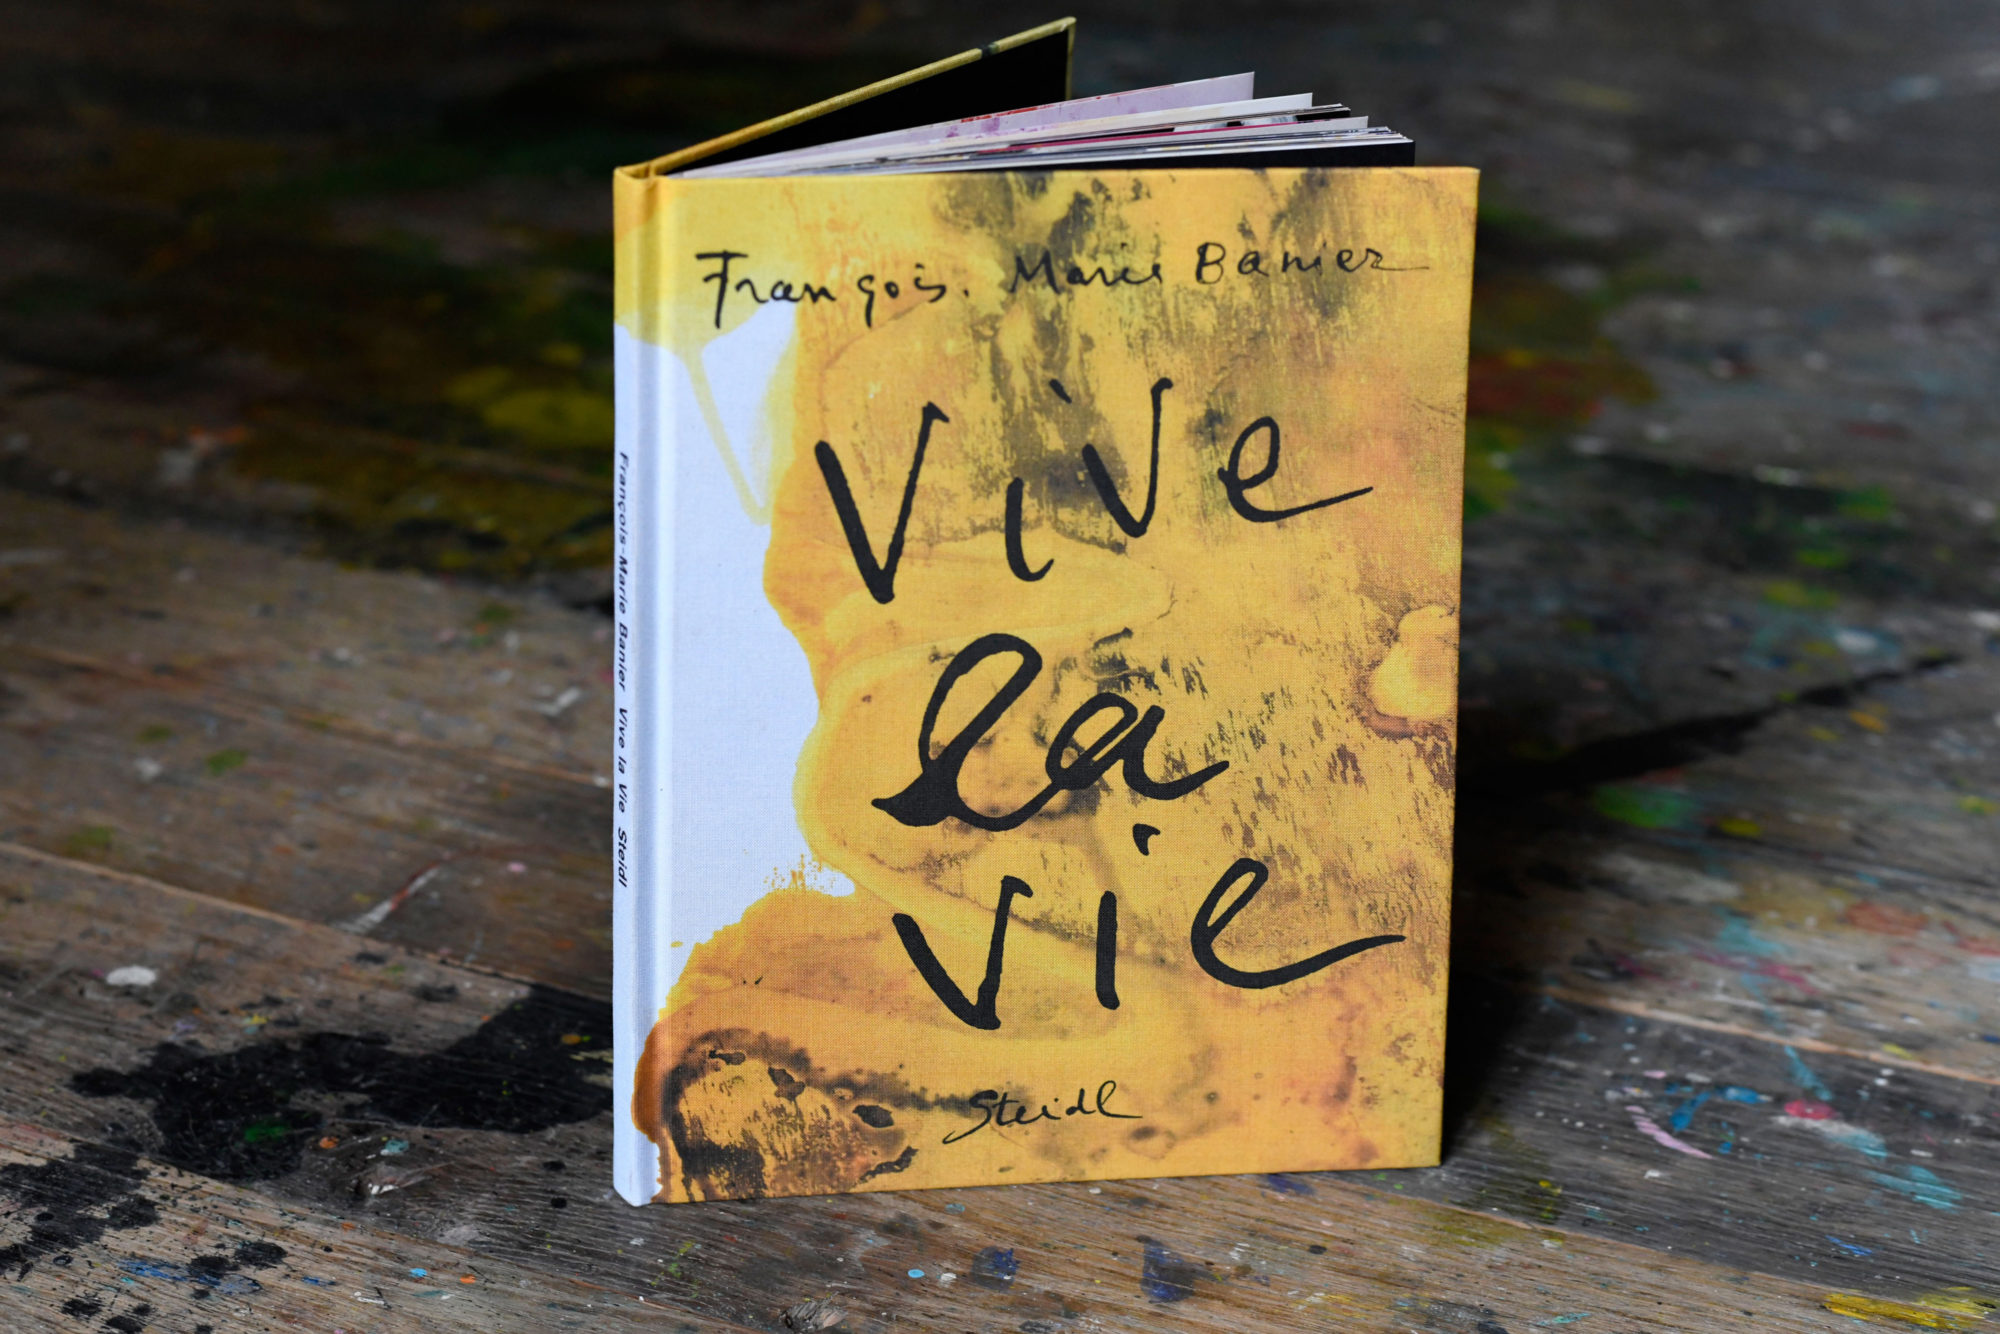 Vive la vie - François-Marie Banier